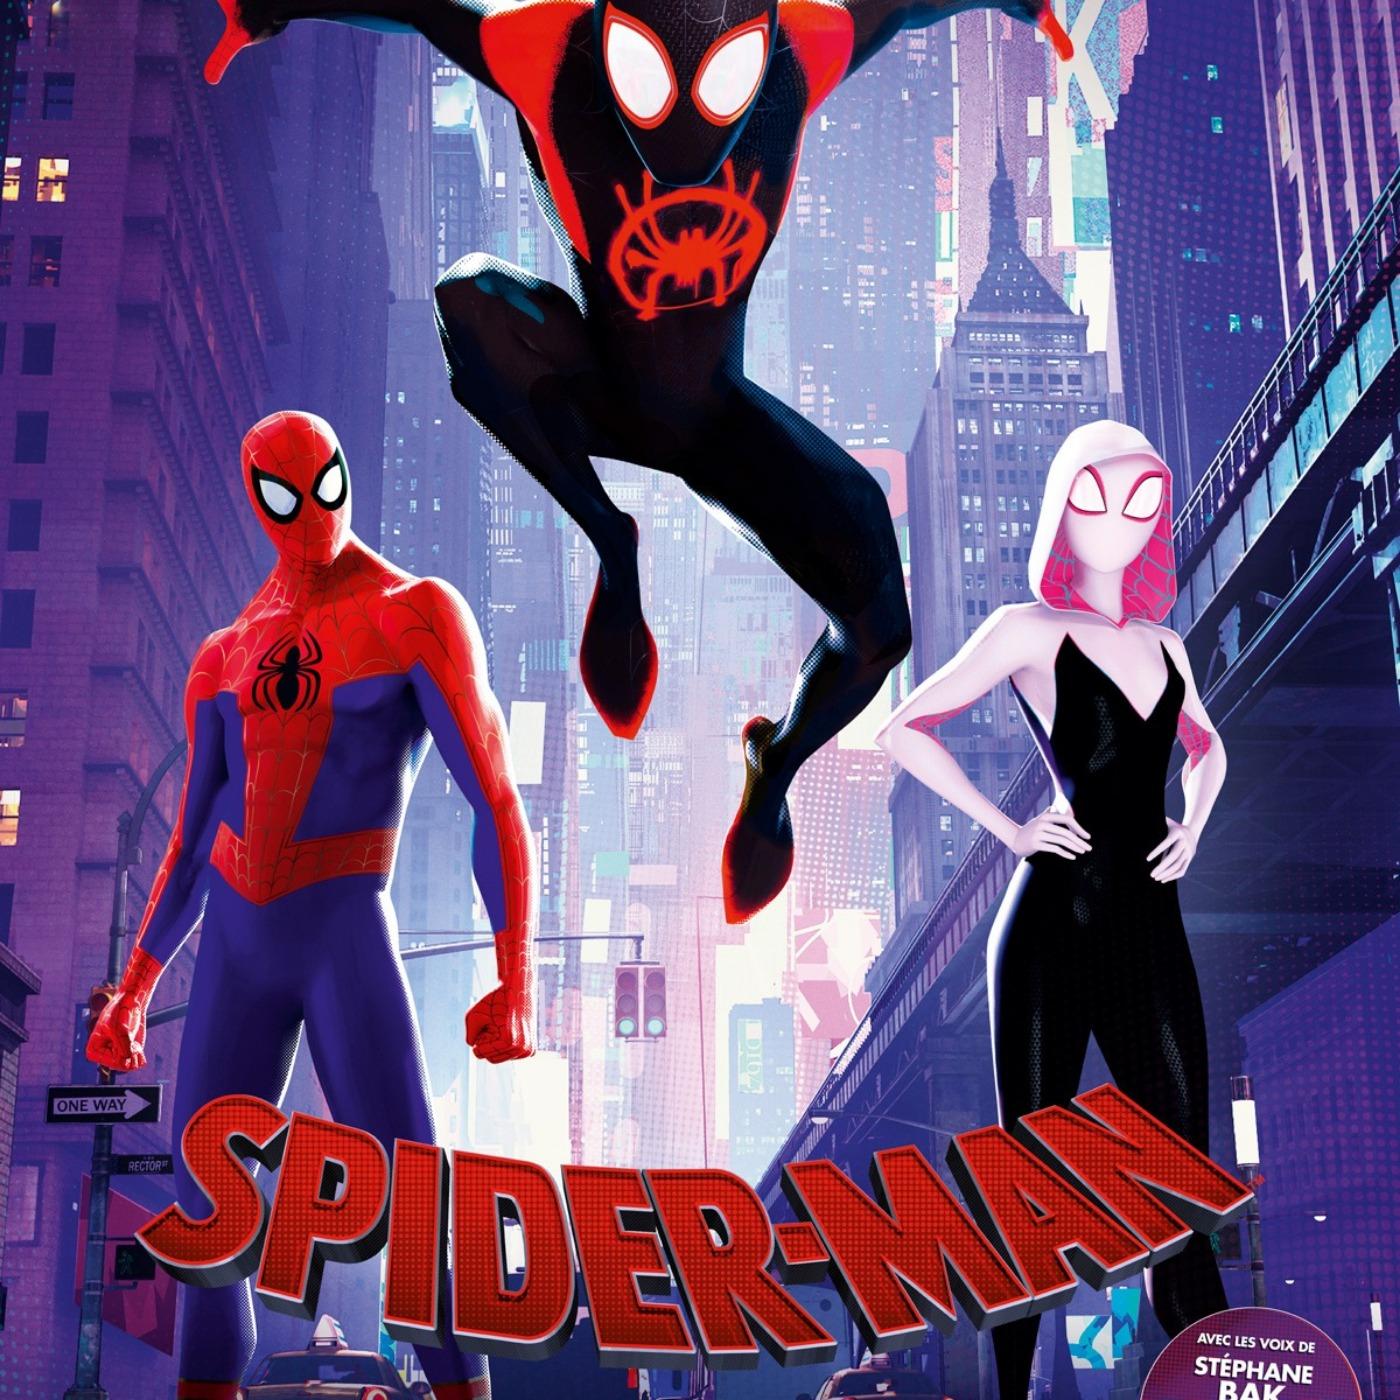 CRITIQUE DU FILM SPIDER-MAN : NEW GENERATION | Ciné Parler #32